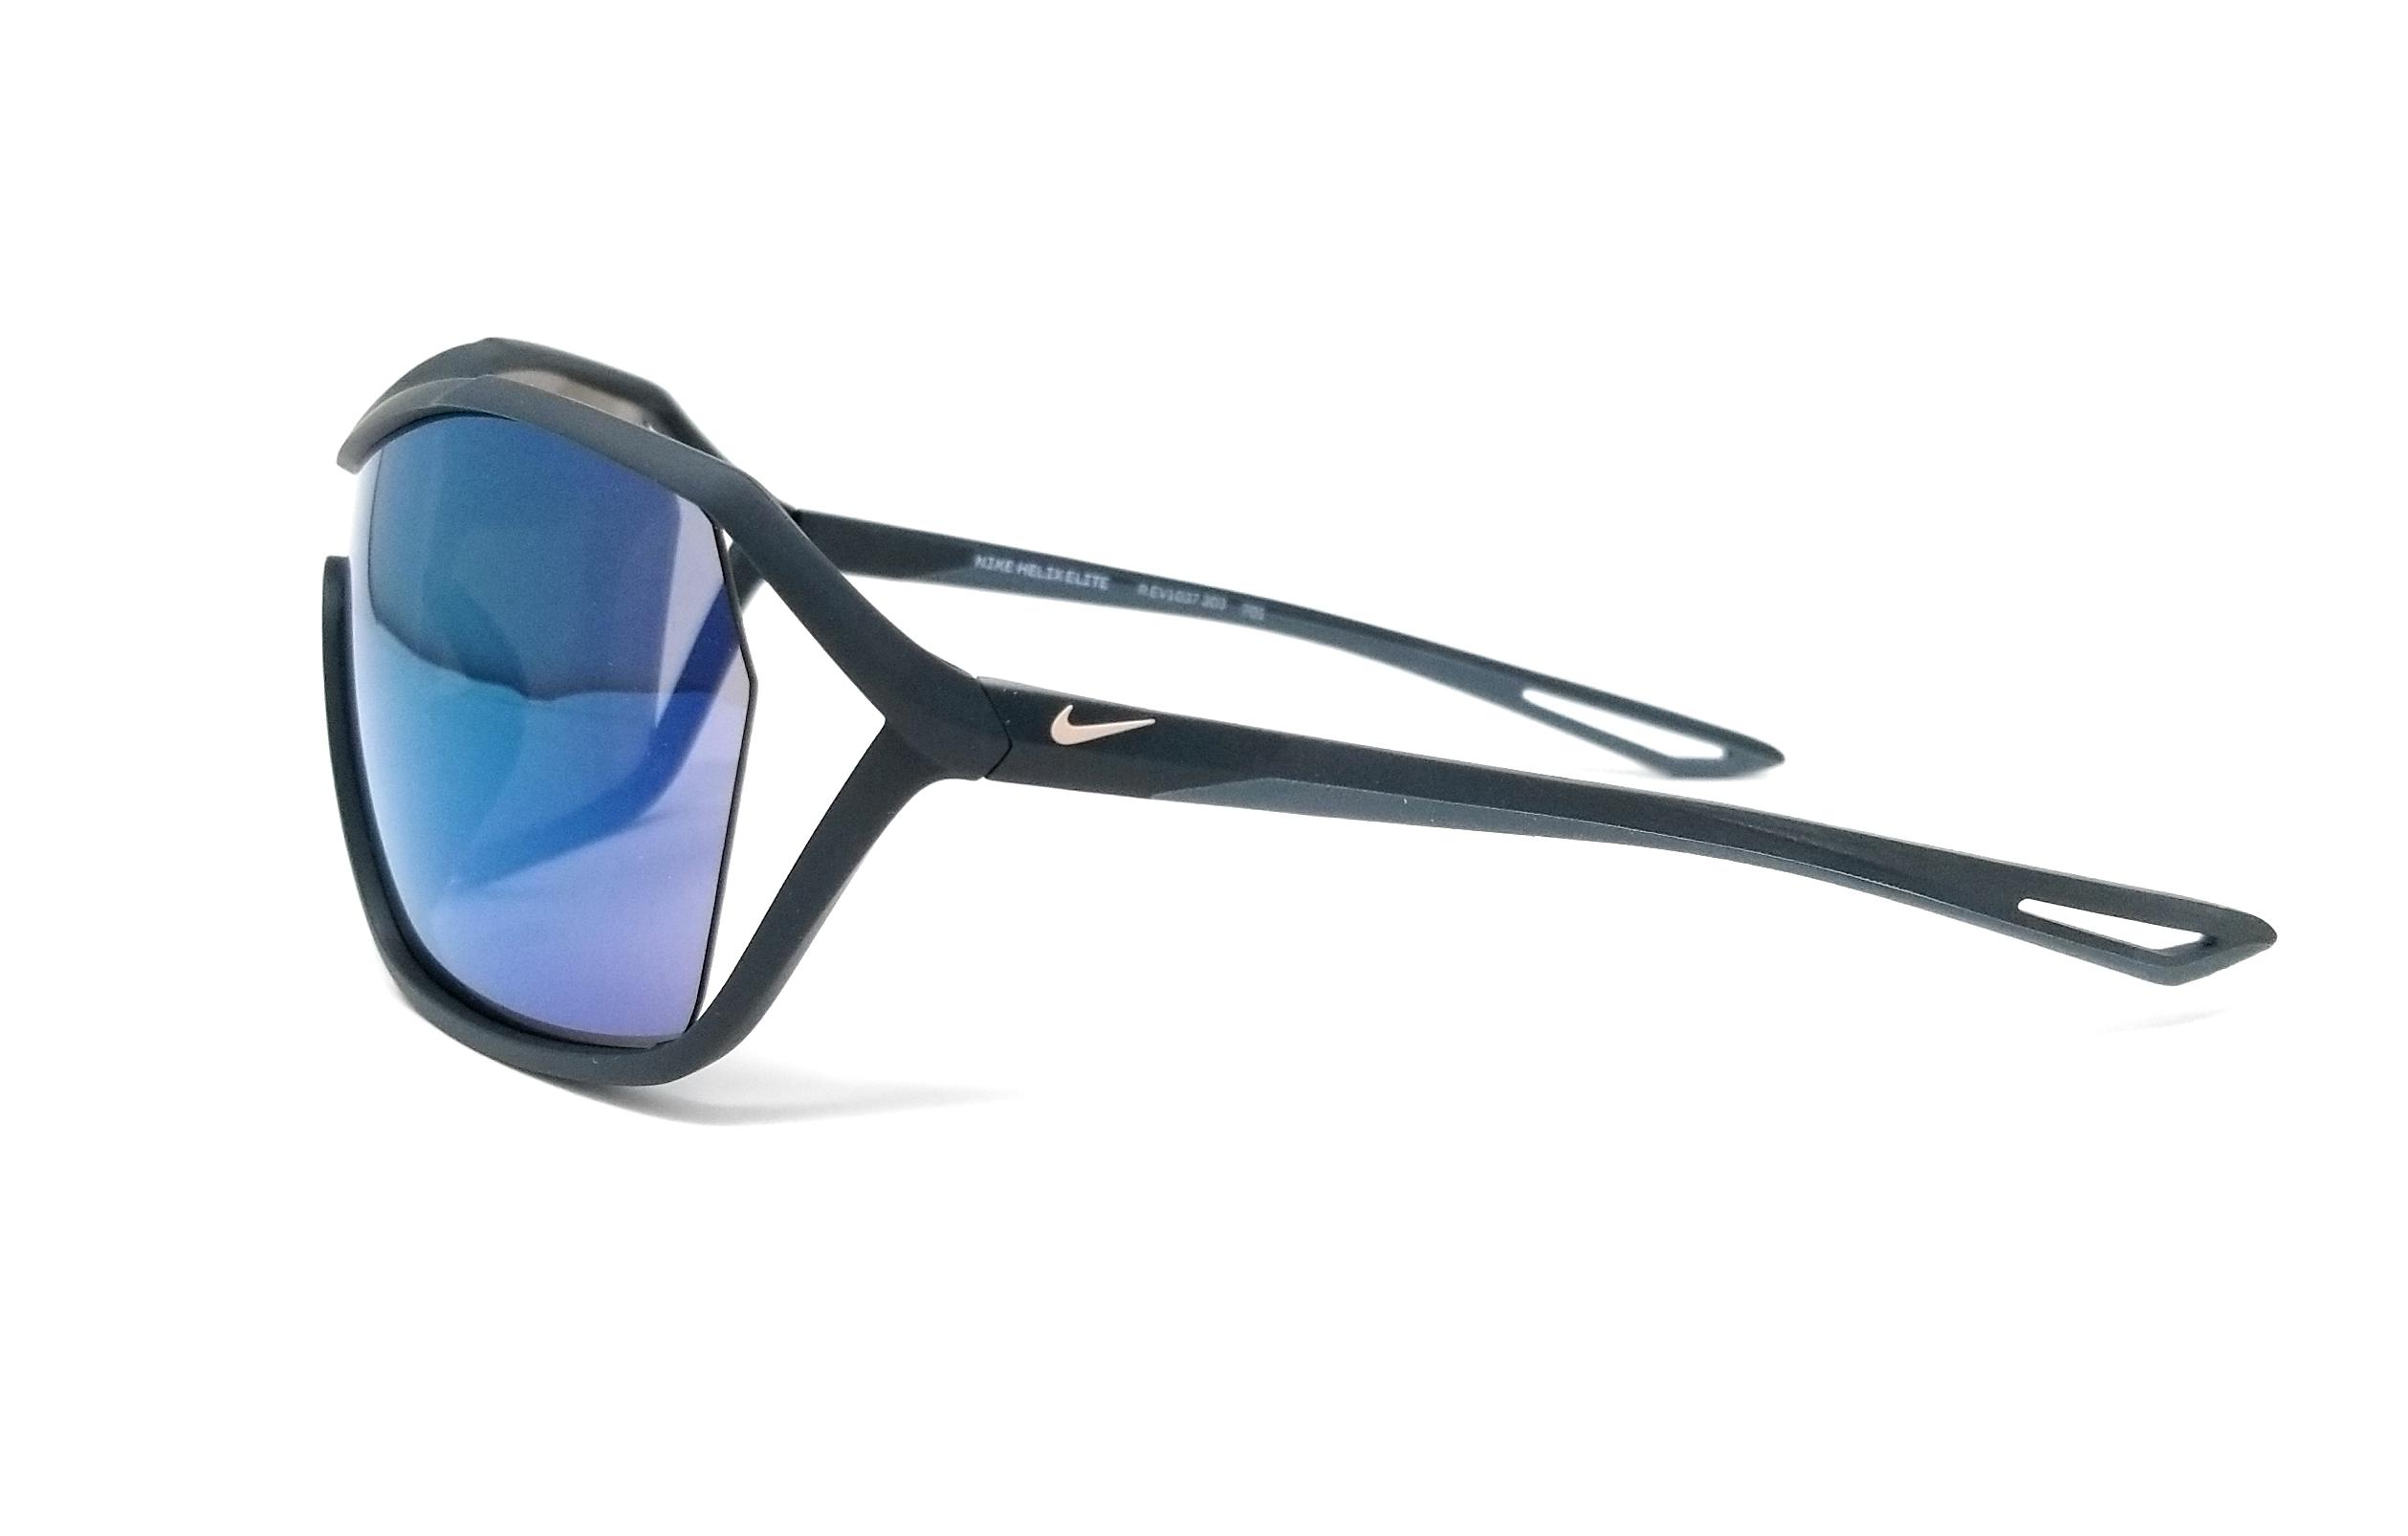 446d03cc1e NIKE Sunglasses HELIX ELITE M EV1037 303 Matte Seaweed Shield 73x09x120